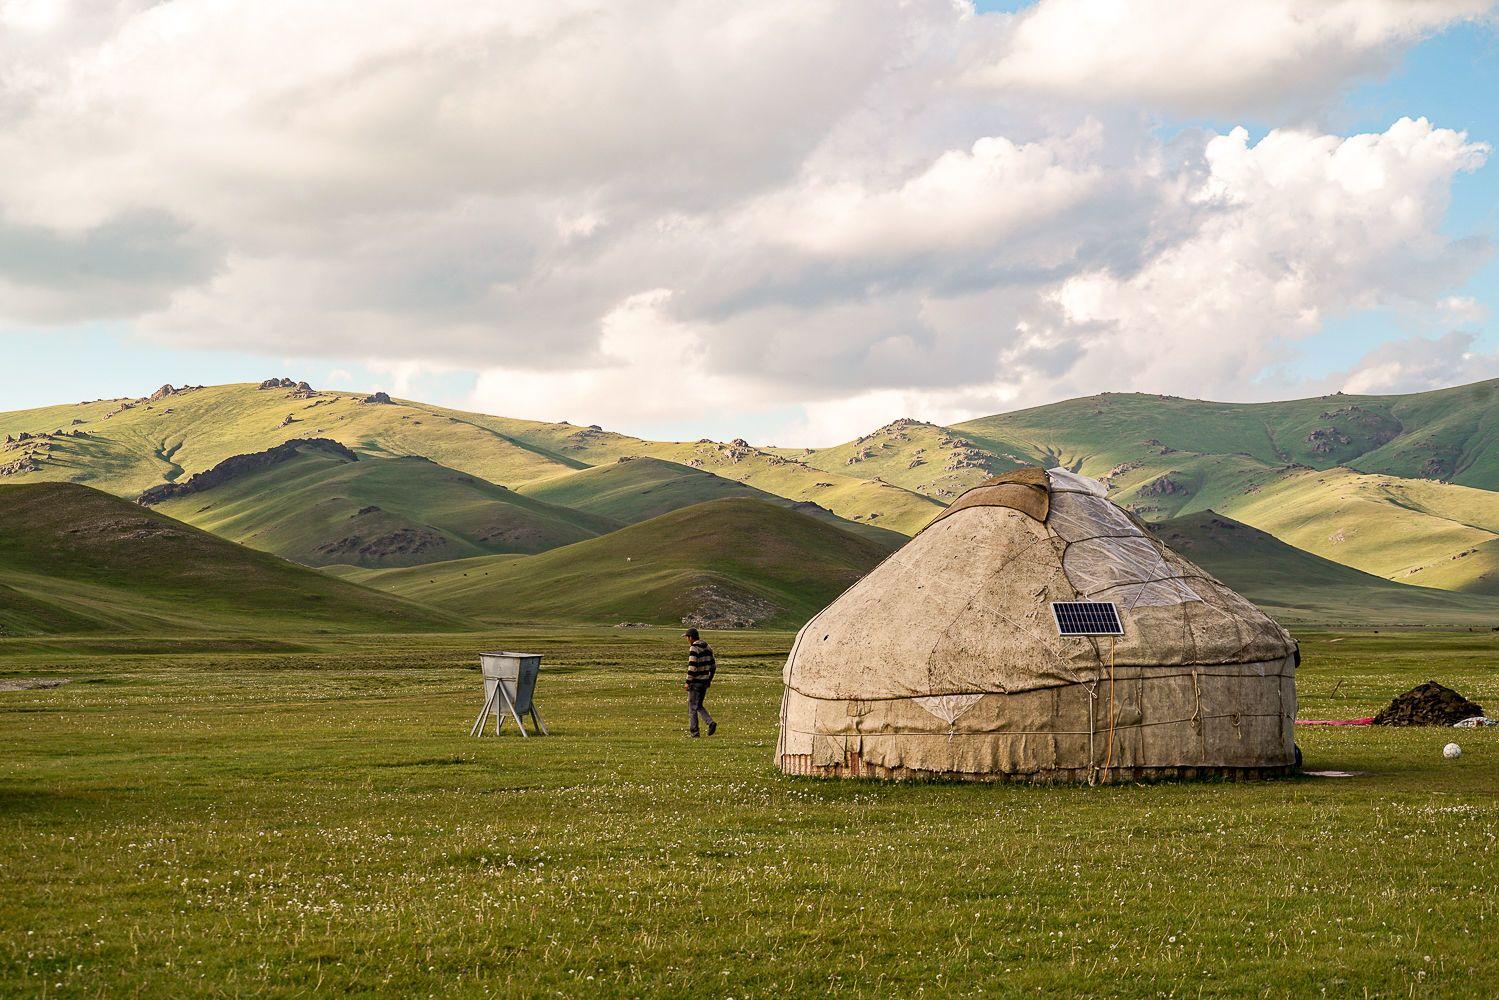 Song Kul, yurt, Kyrgyzstan